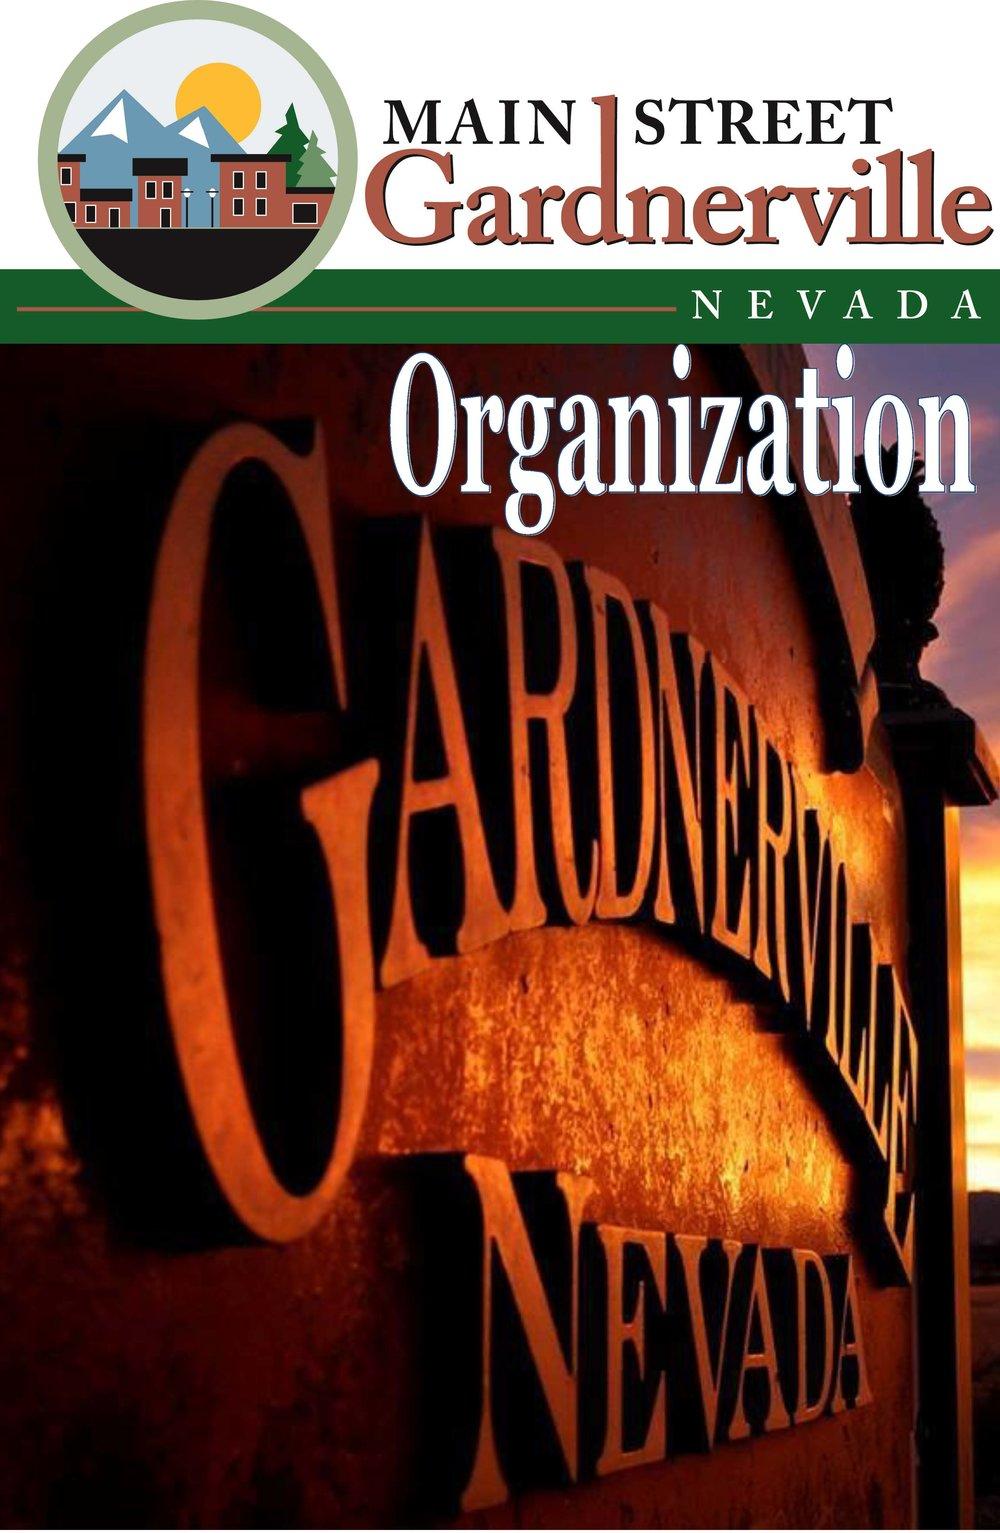 ORGANIZATION COMMITTEE - Volunteer Development, Member Recruitment, Communications, Fundraising and Training.